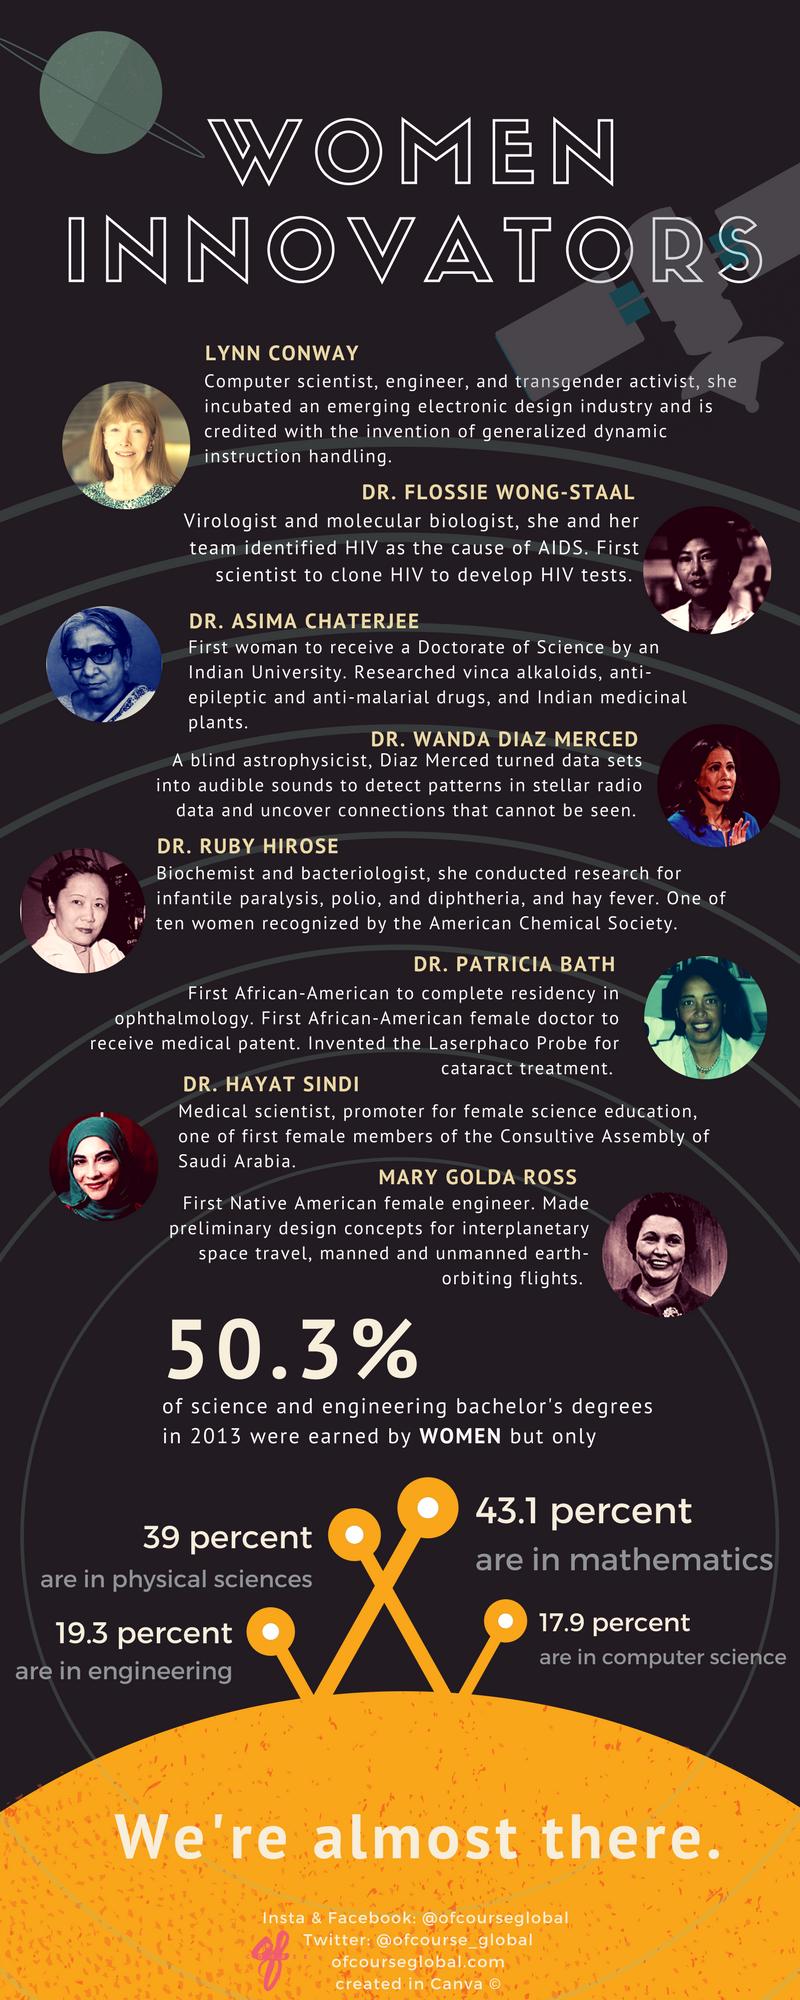 women innovators line up